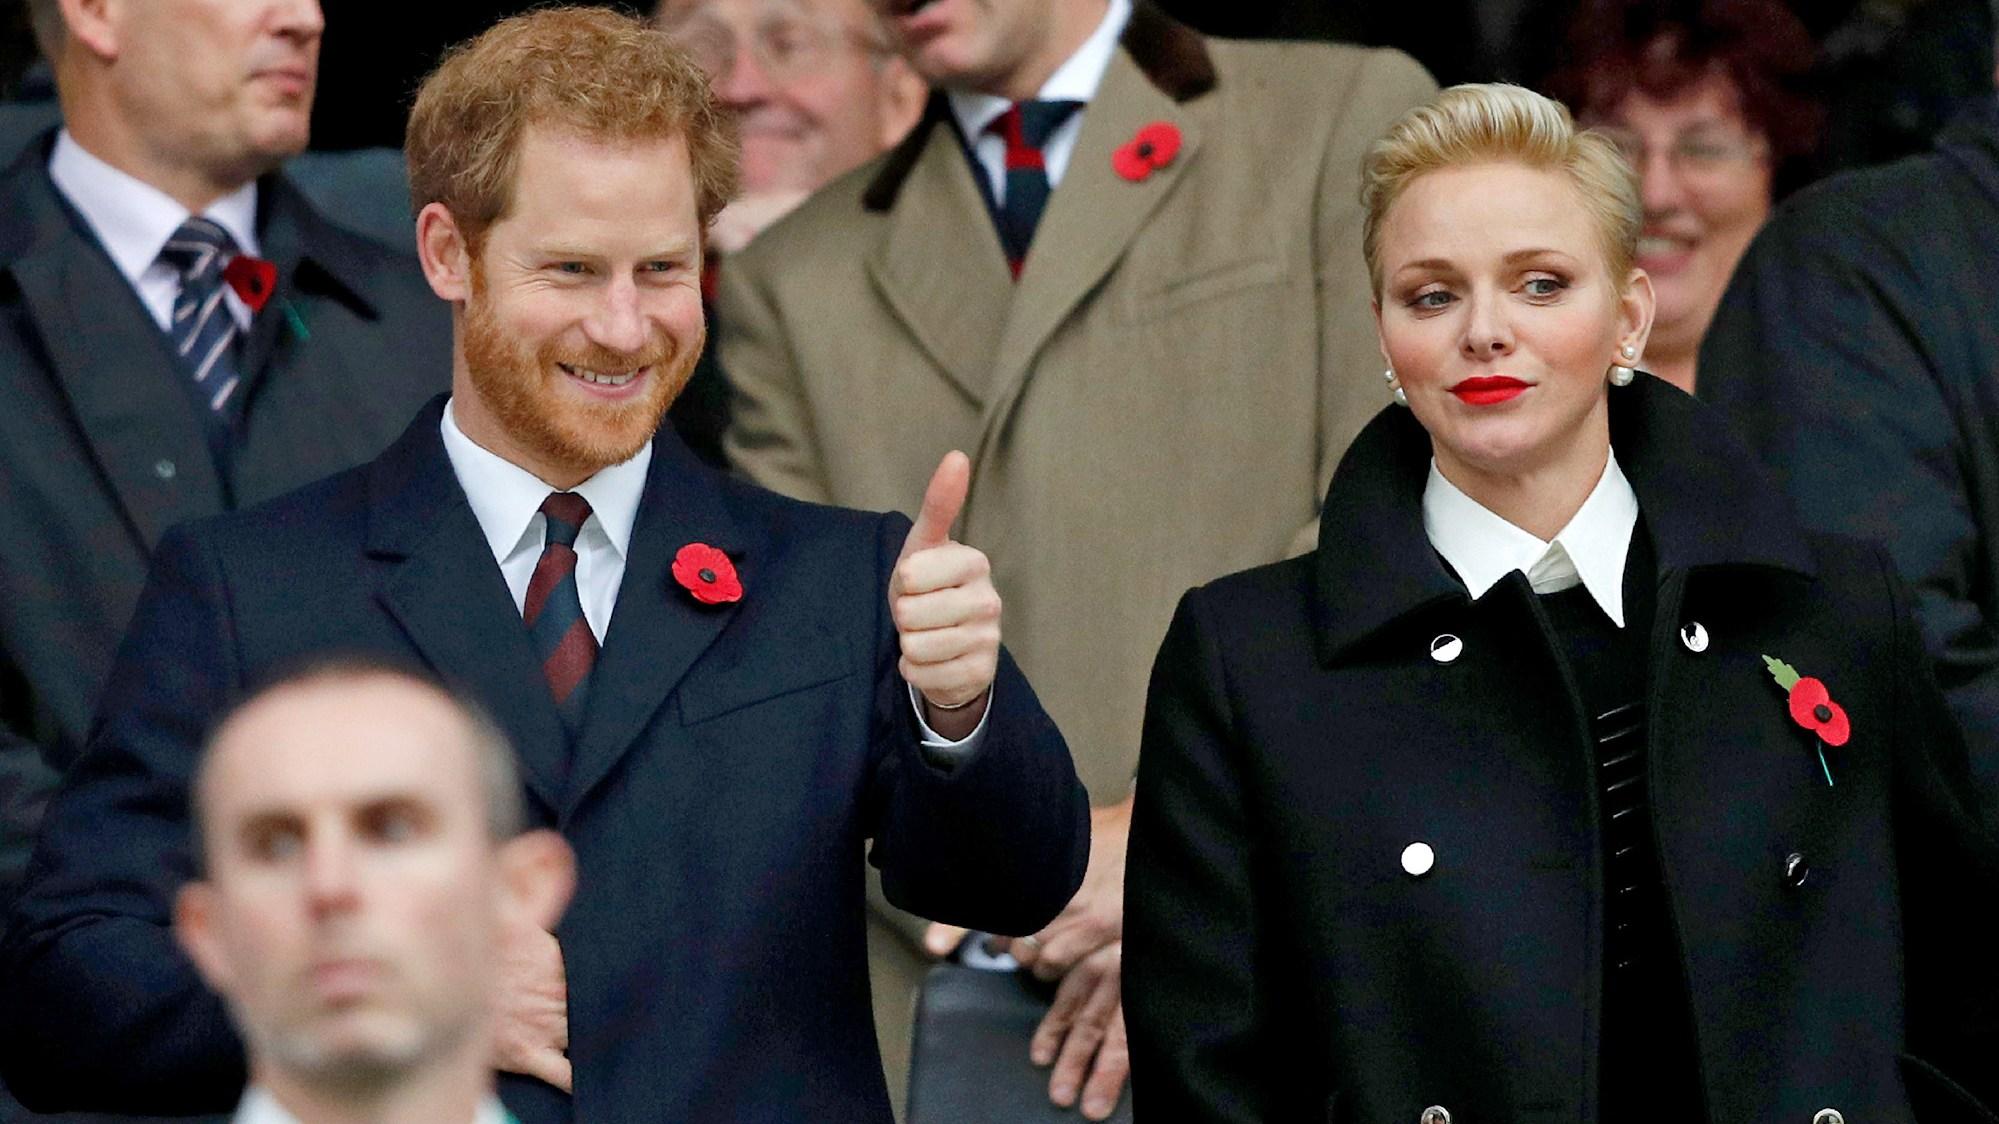 Prince Harry and Princess Charlene of Monaco